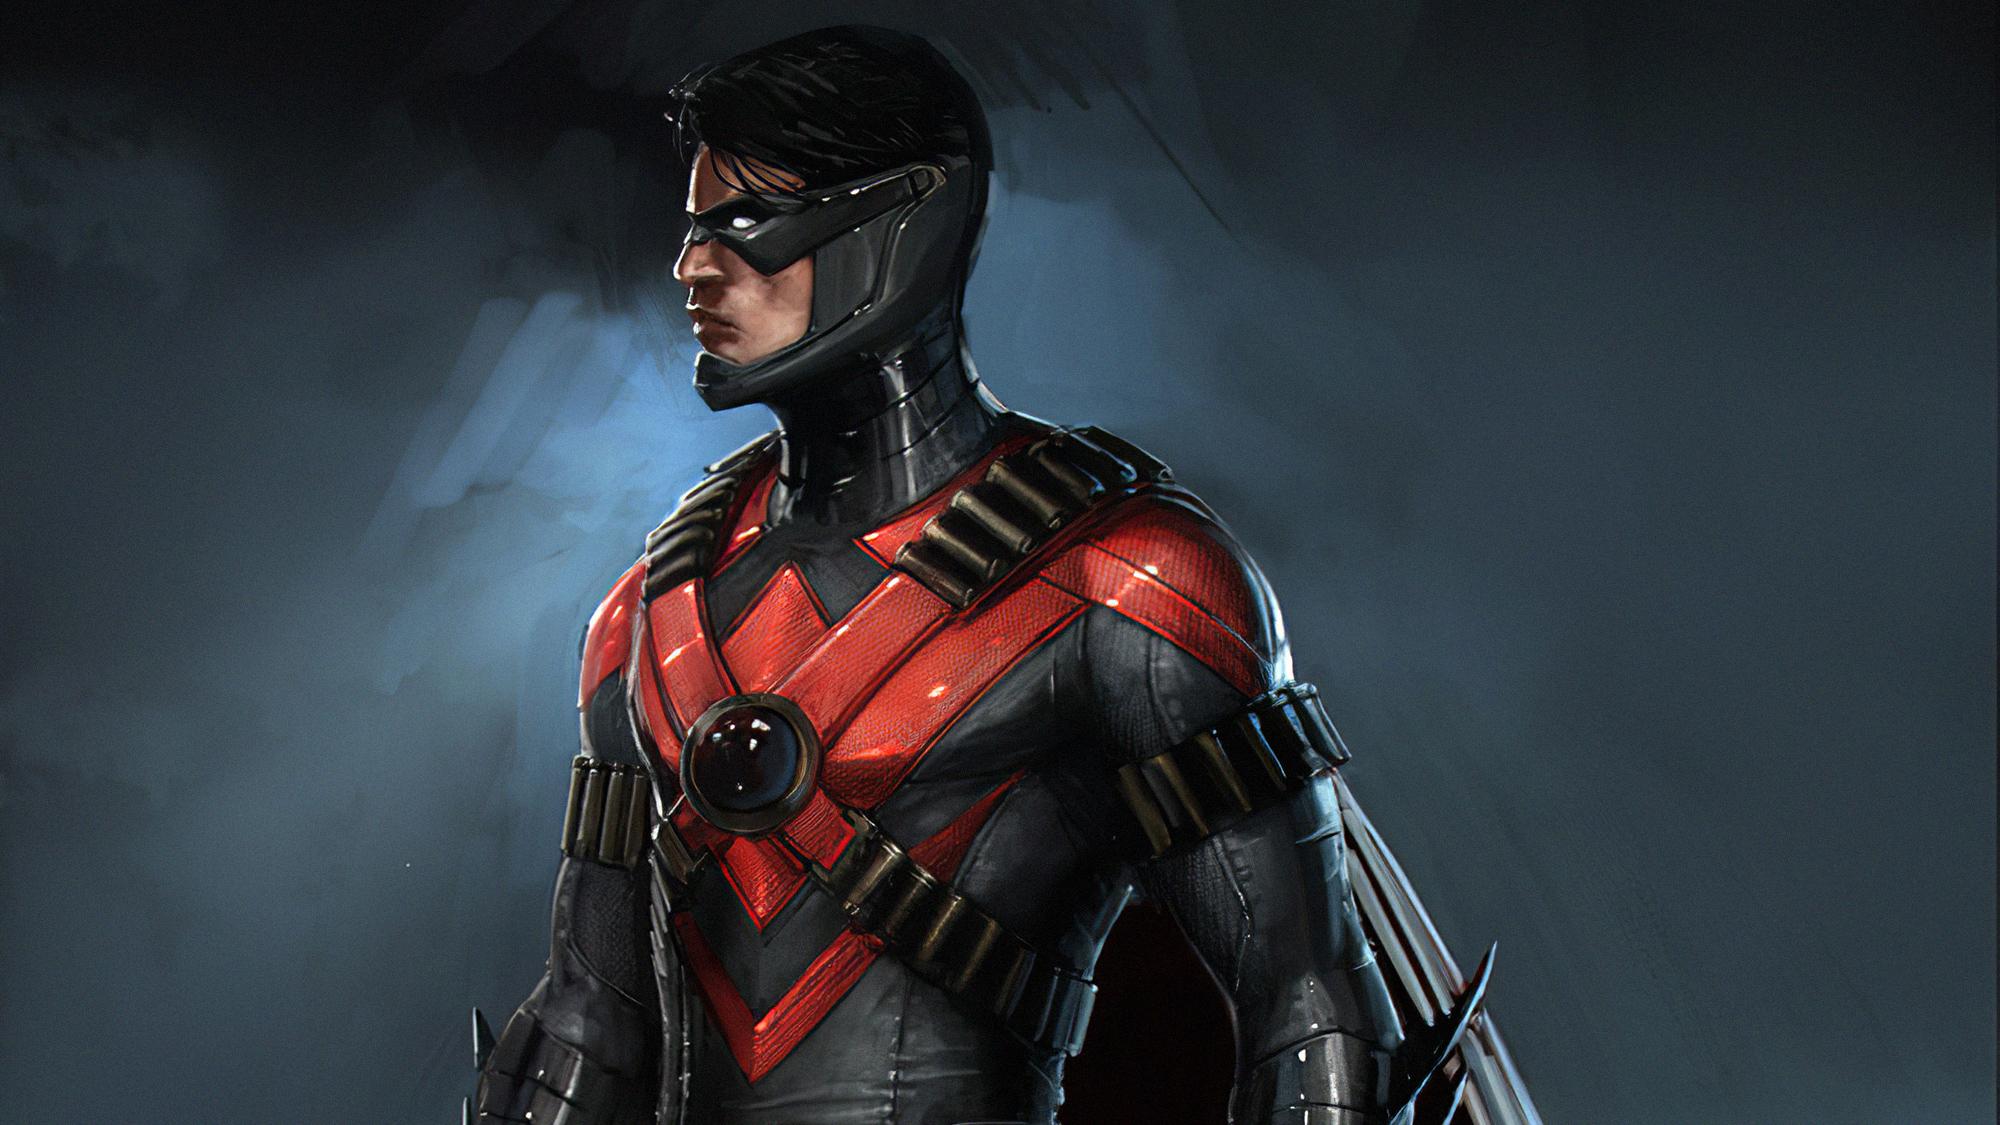 Nightwing Injustice 2 Wallpaper, HD Games 4K Wallpapers ...